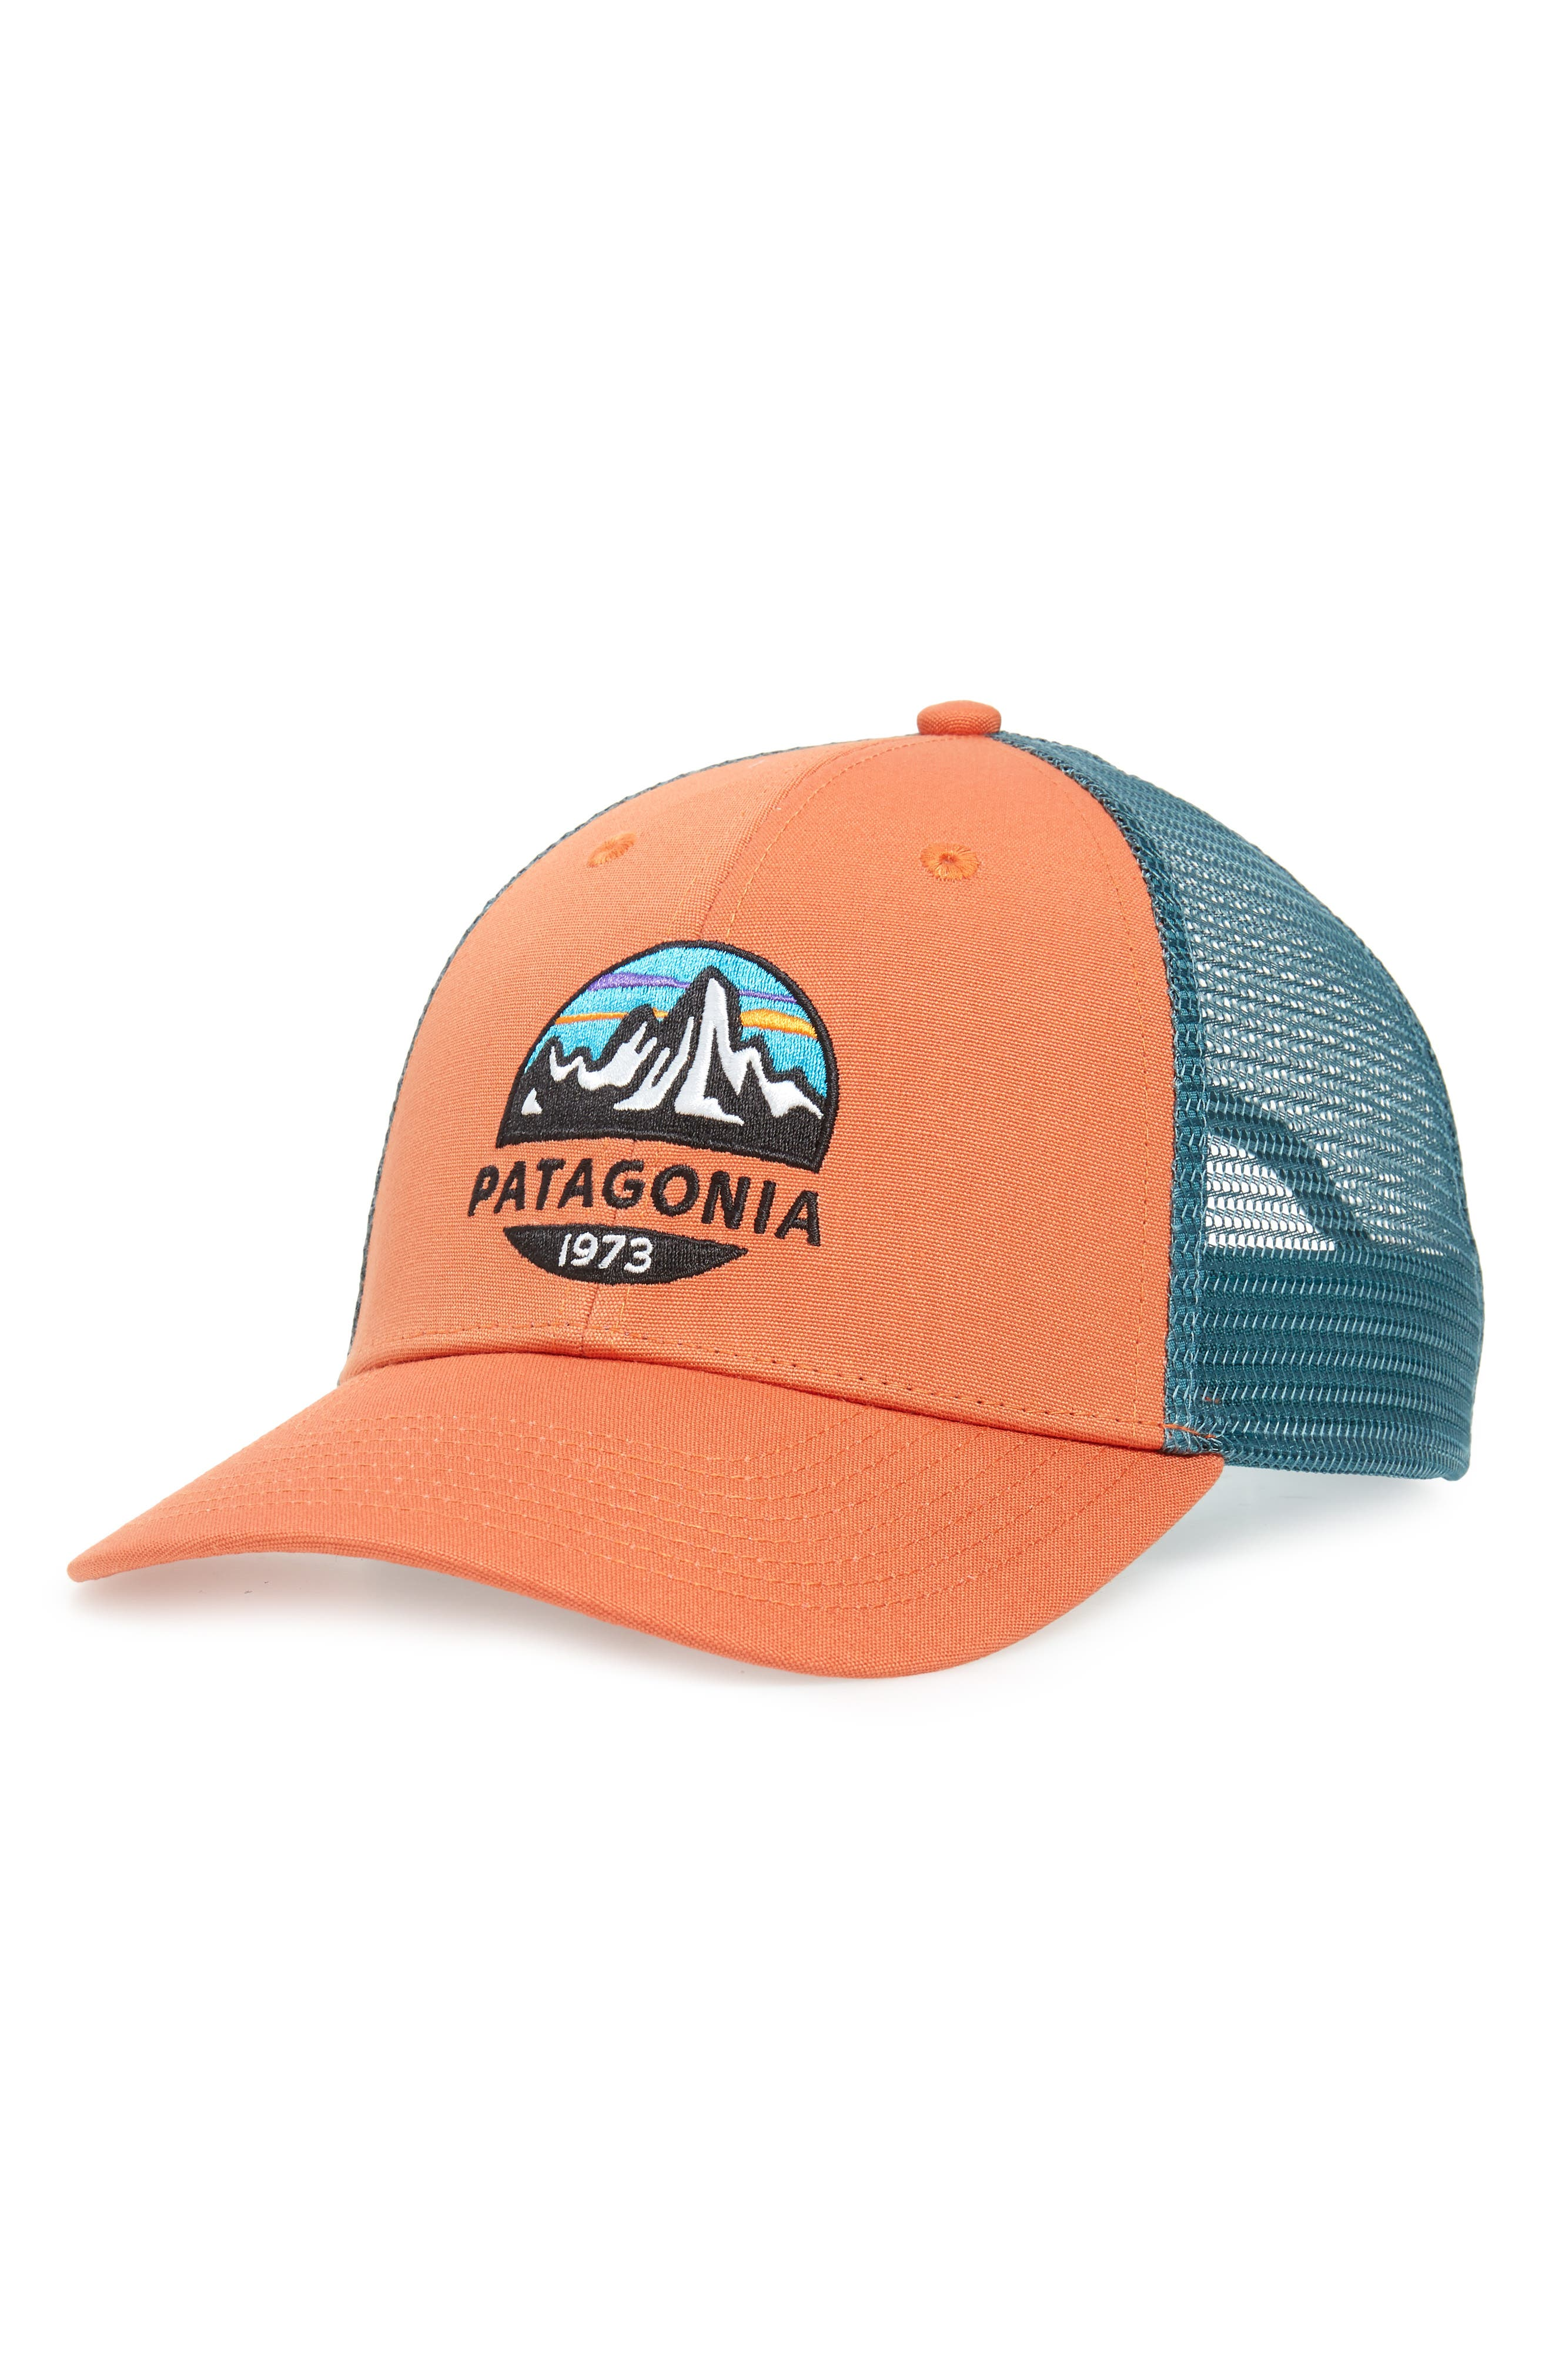 d9e89d078bb1c patagonia hat